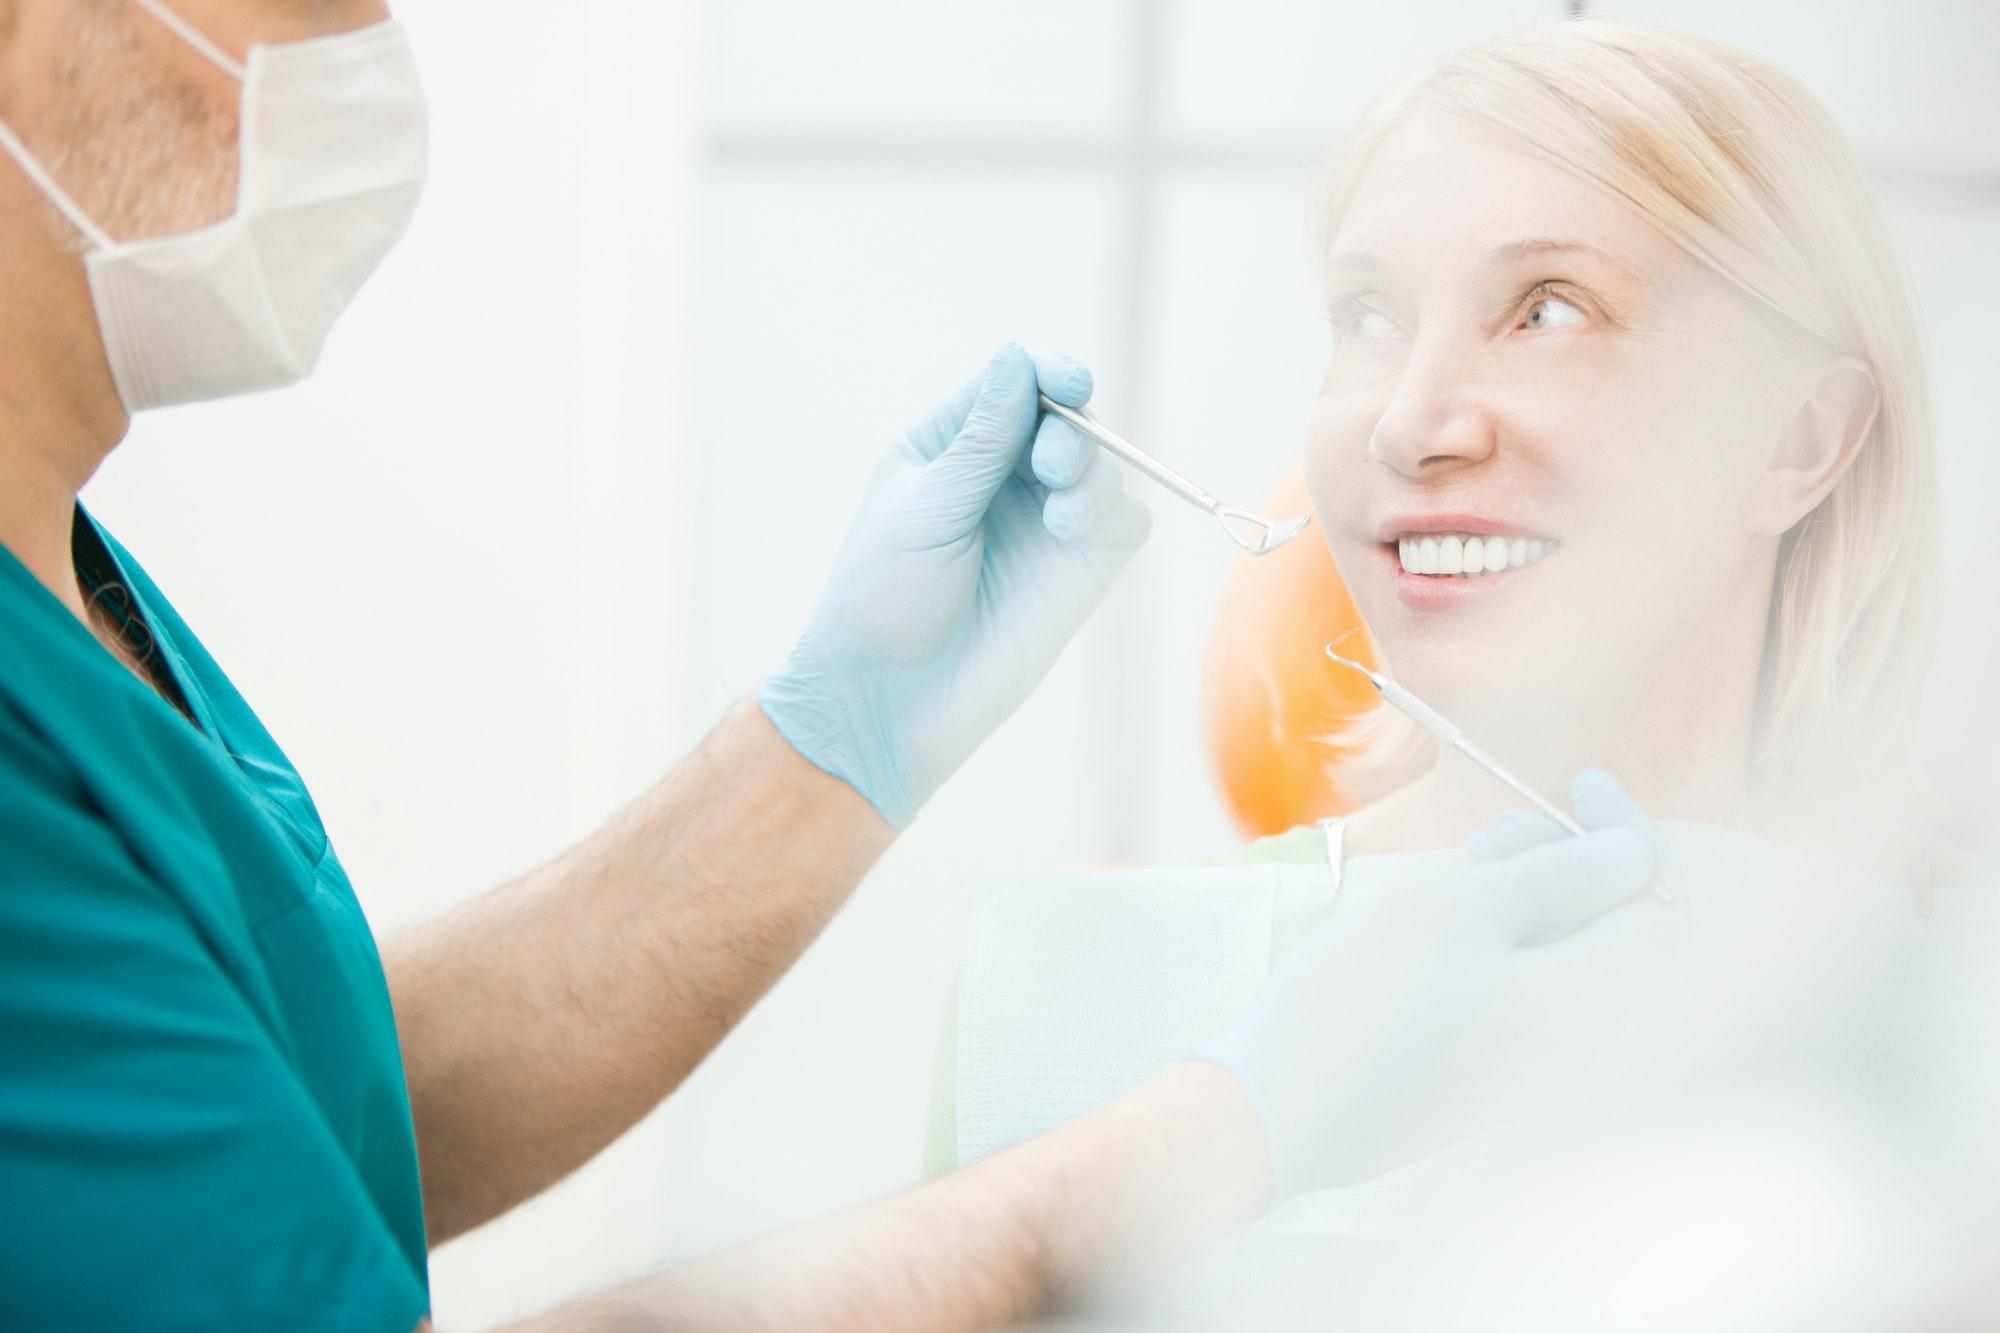 Woman in dental clinics